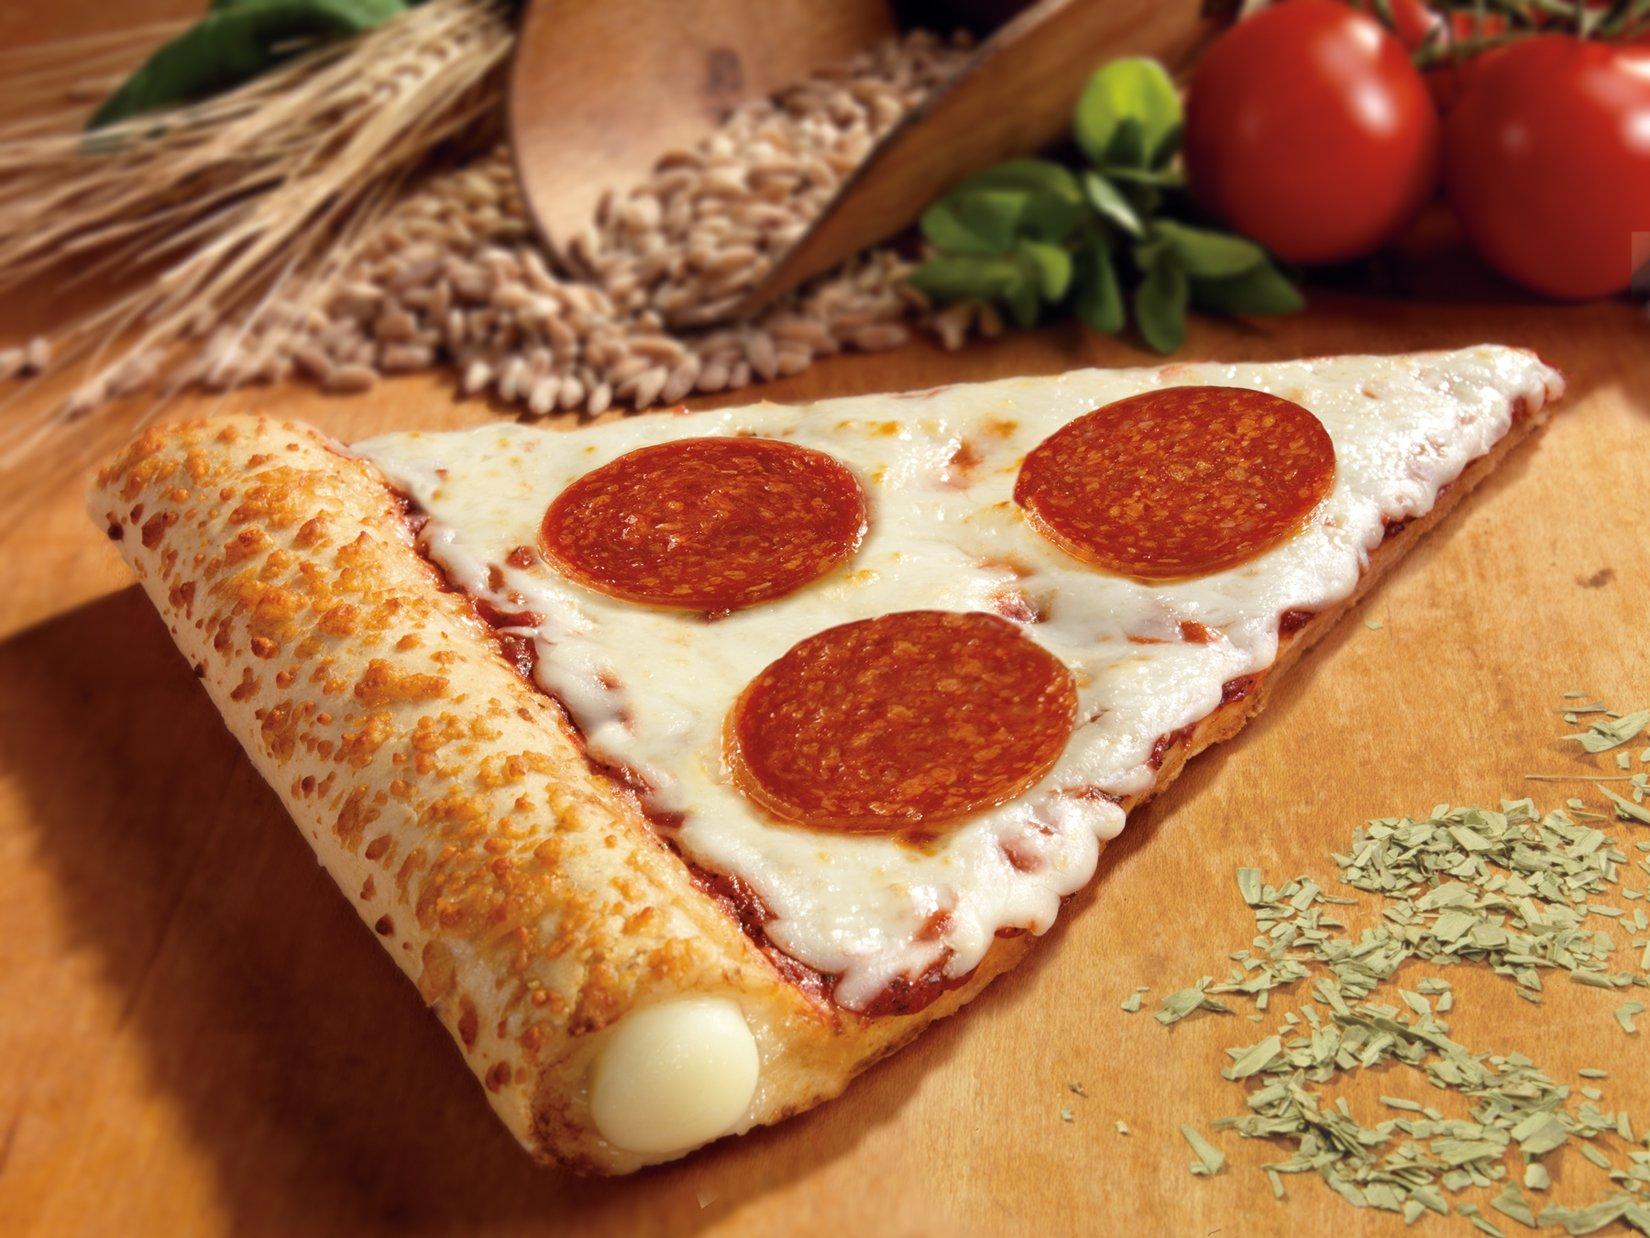 The Max Whole Grain Reduced Fat Stuffed Crust Pepperoni Pizza Slice, 0.304 oz. (72 count)